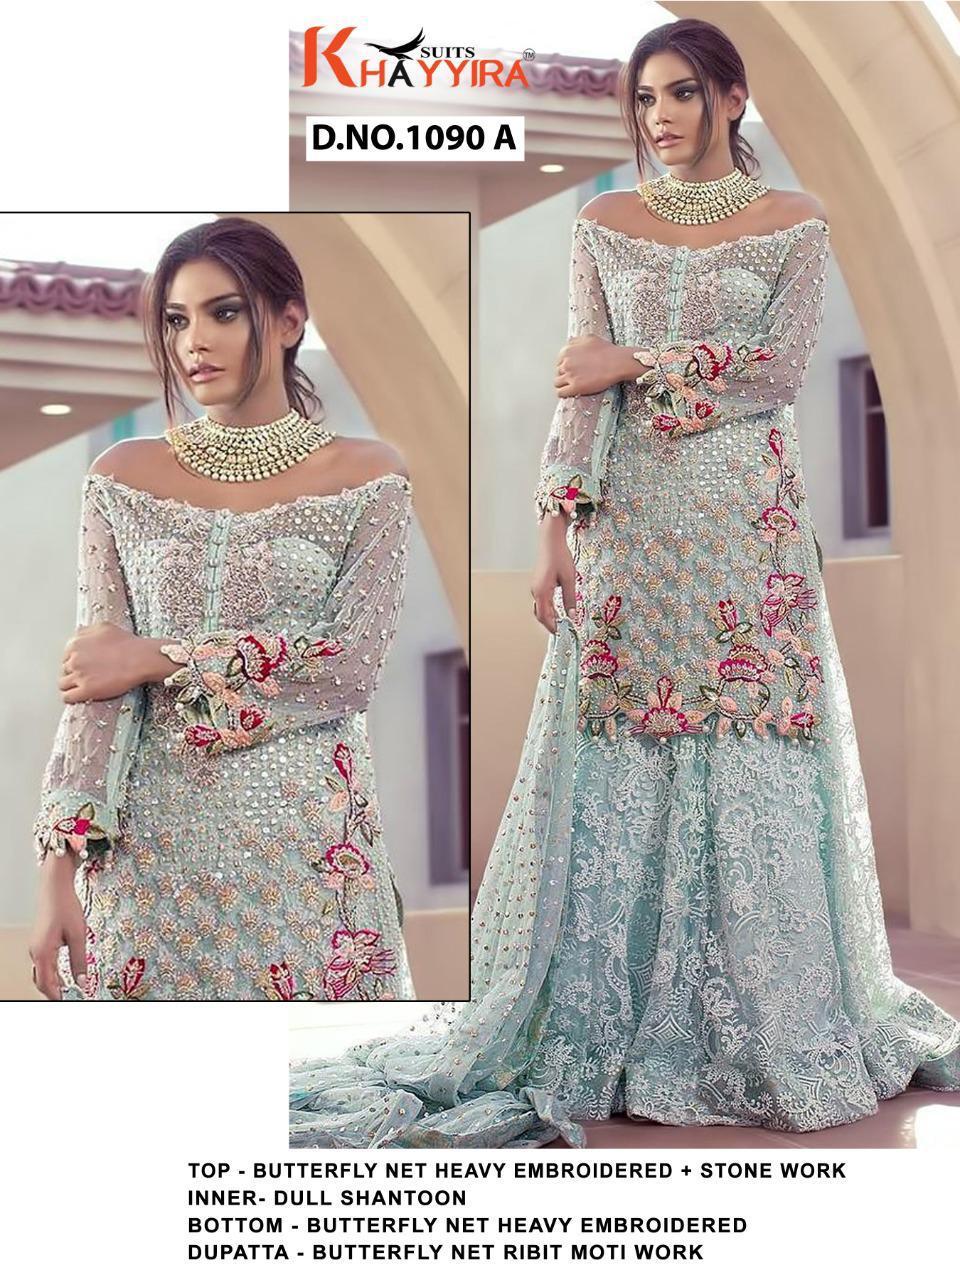 Khayyira Saira Dn 1090 Designer Butterfly Net Embroidered Pakistani suits